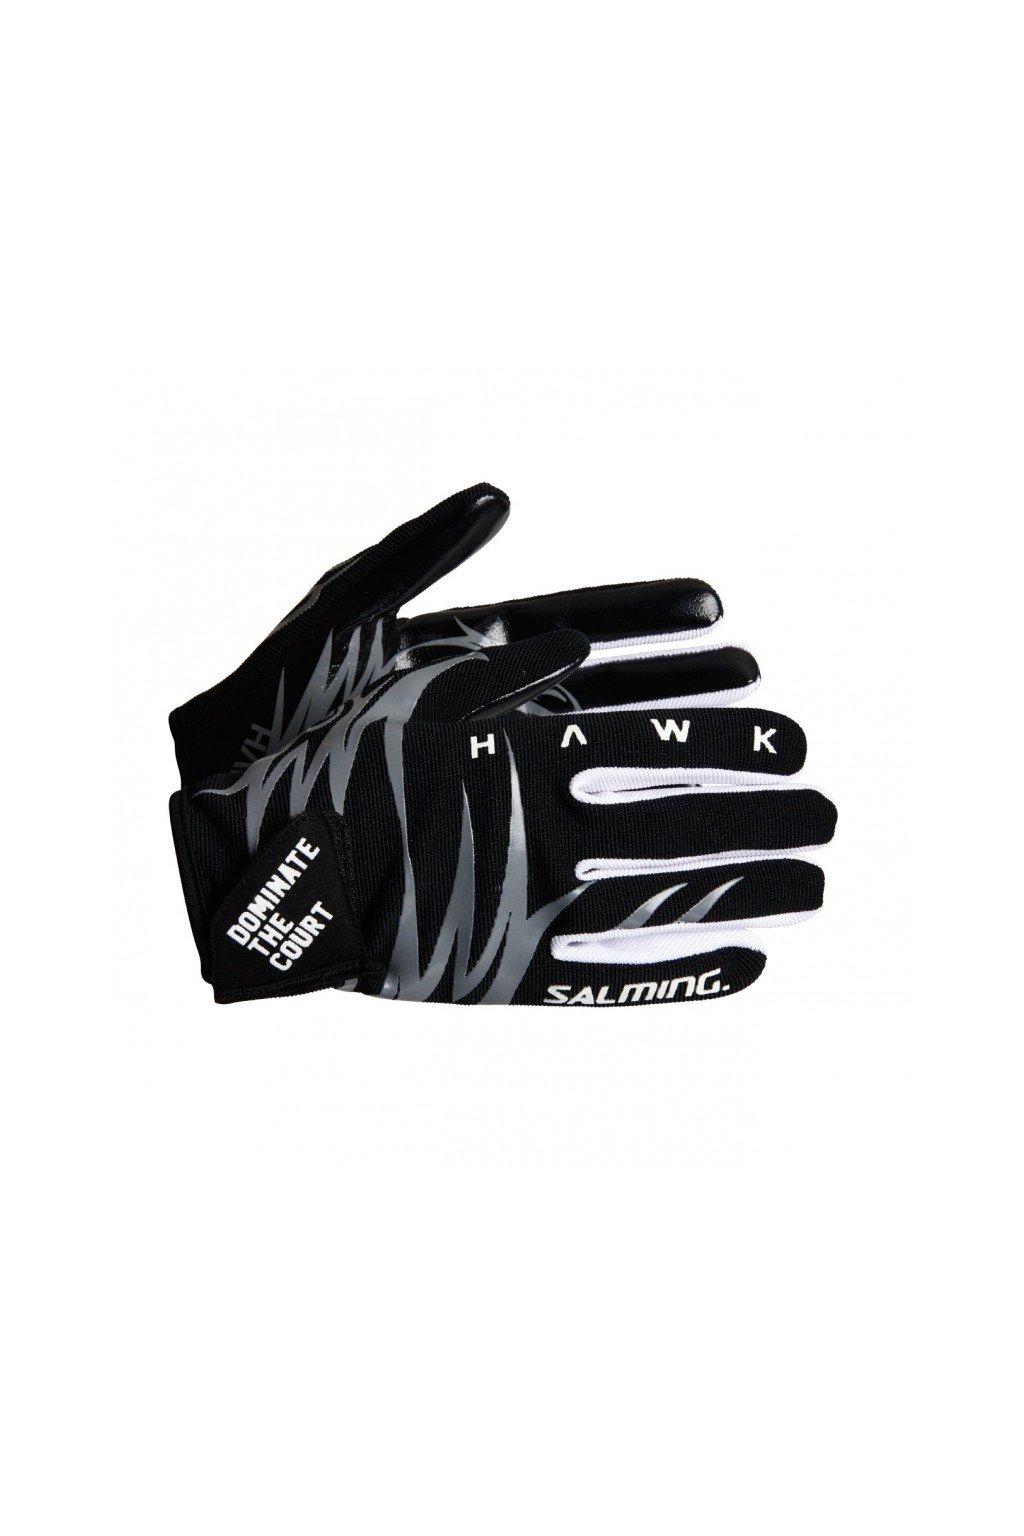 salming hawk gloves black grey m